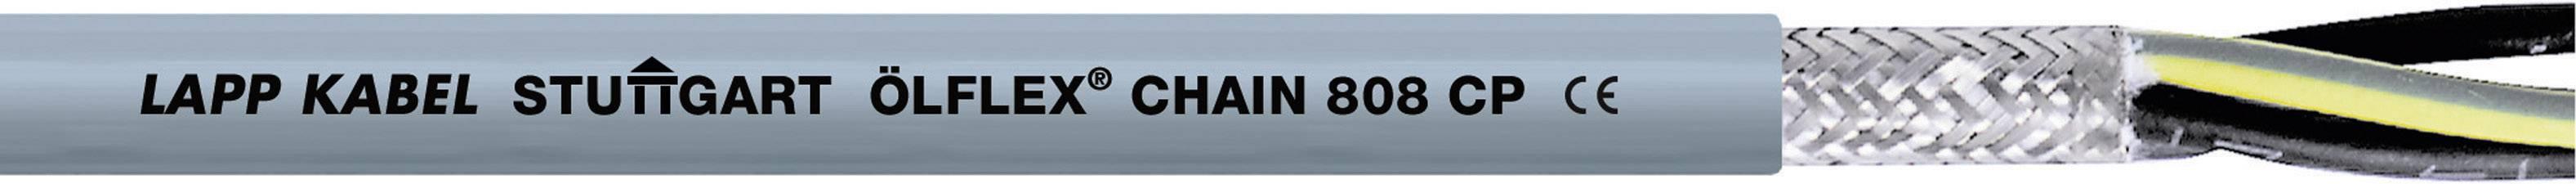 Žíla kabelu LappKabel ÖLFLEX CHAIN 808 CP 2X1,5 (1027775), 2x 1,5 mm², polyurethan, Ø 7,1 mm, stíněný, 100 m,